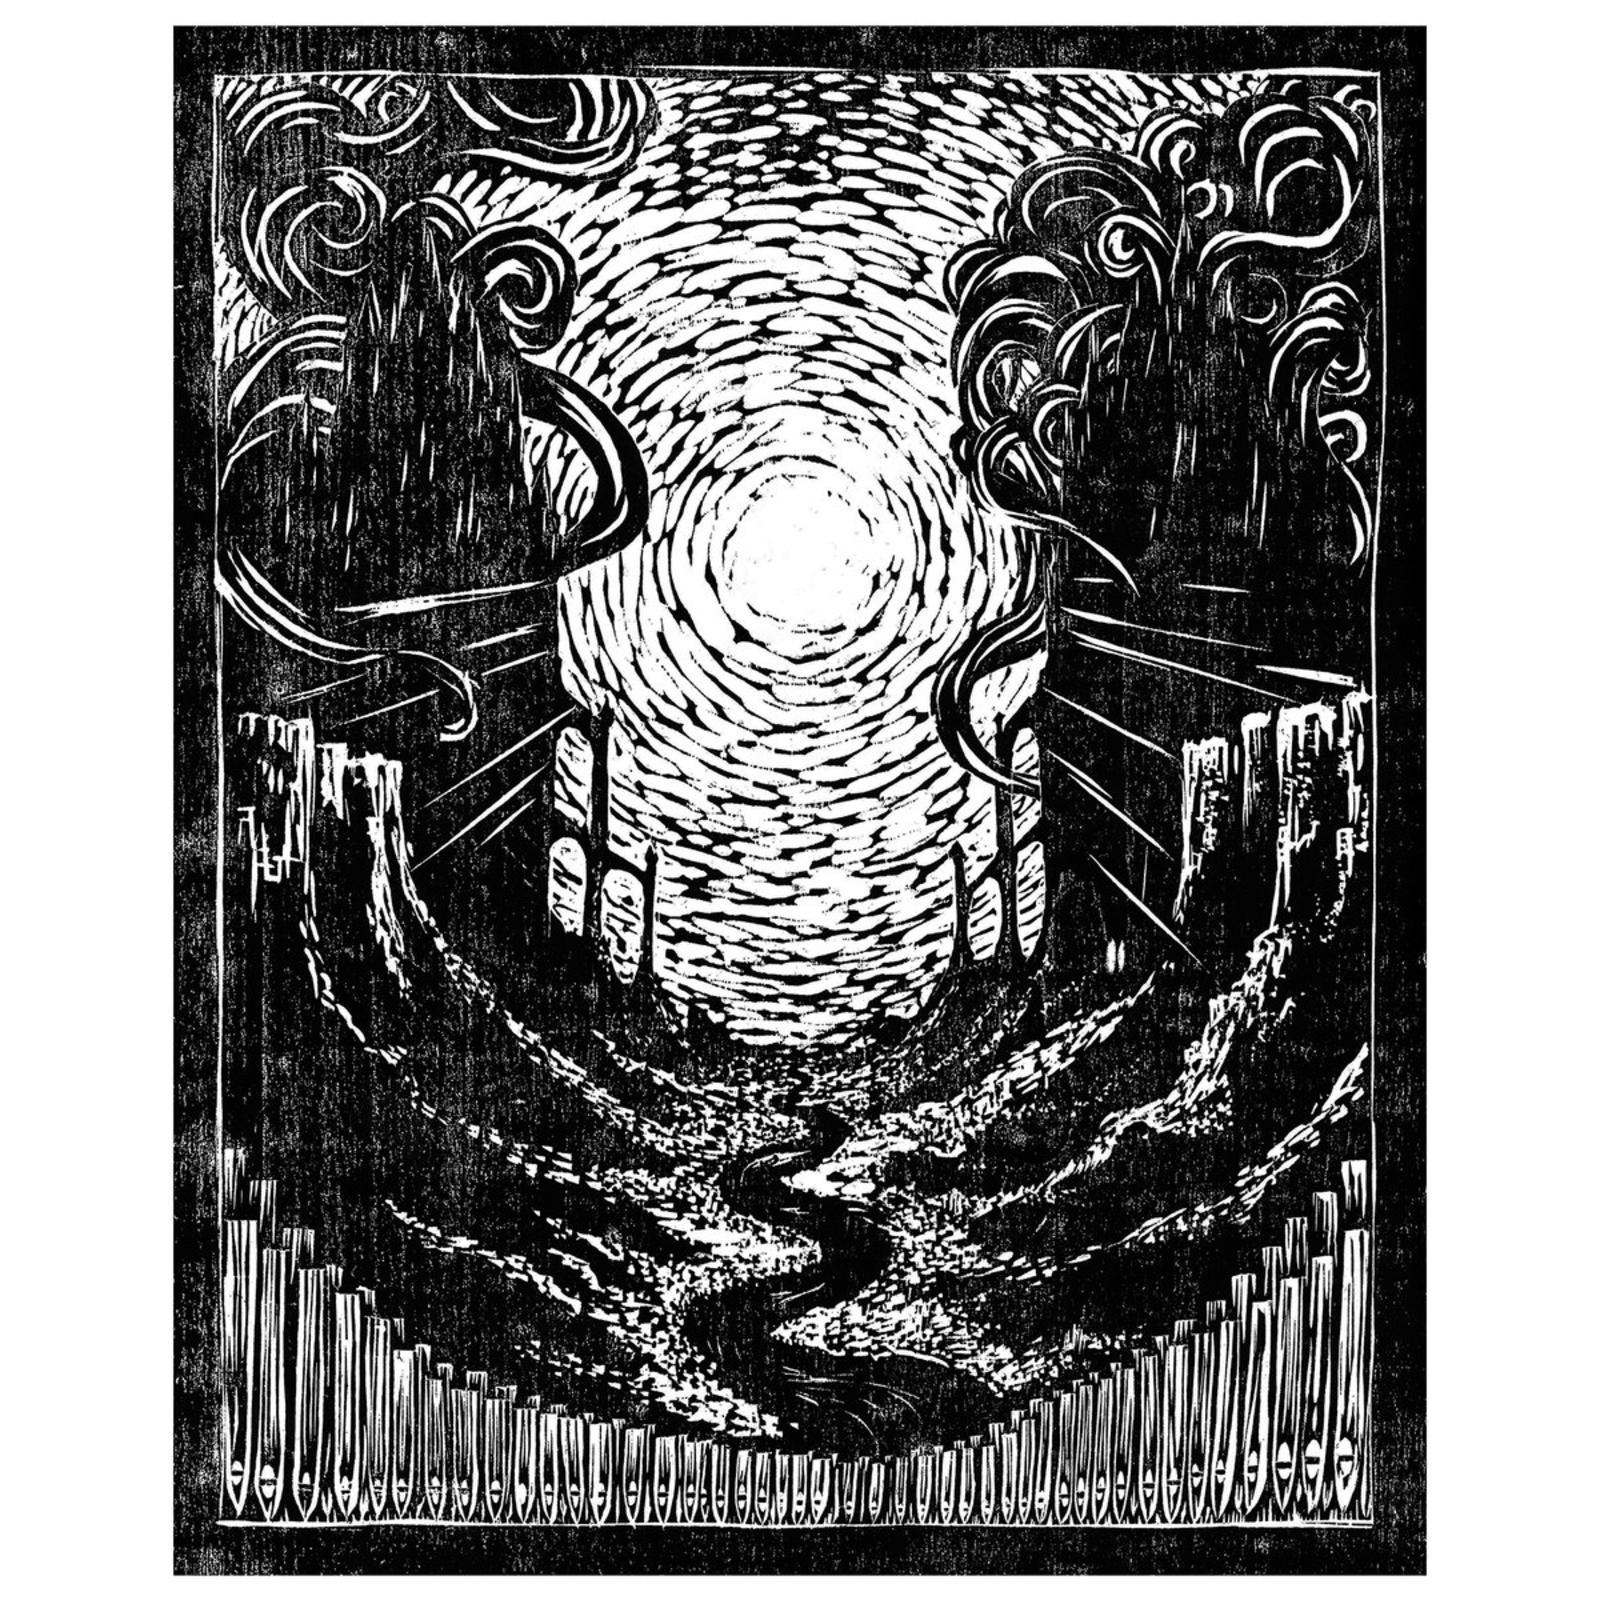 Kali Malone - Artwork